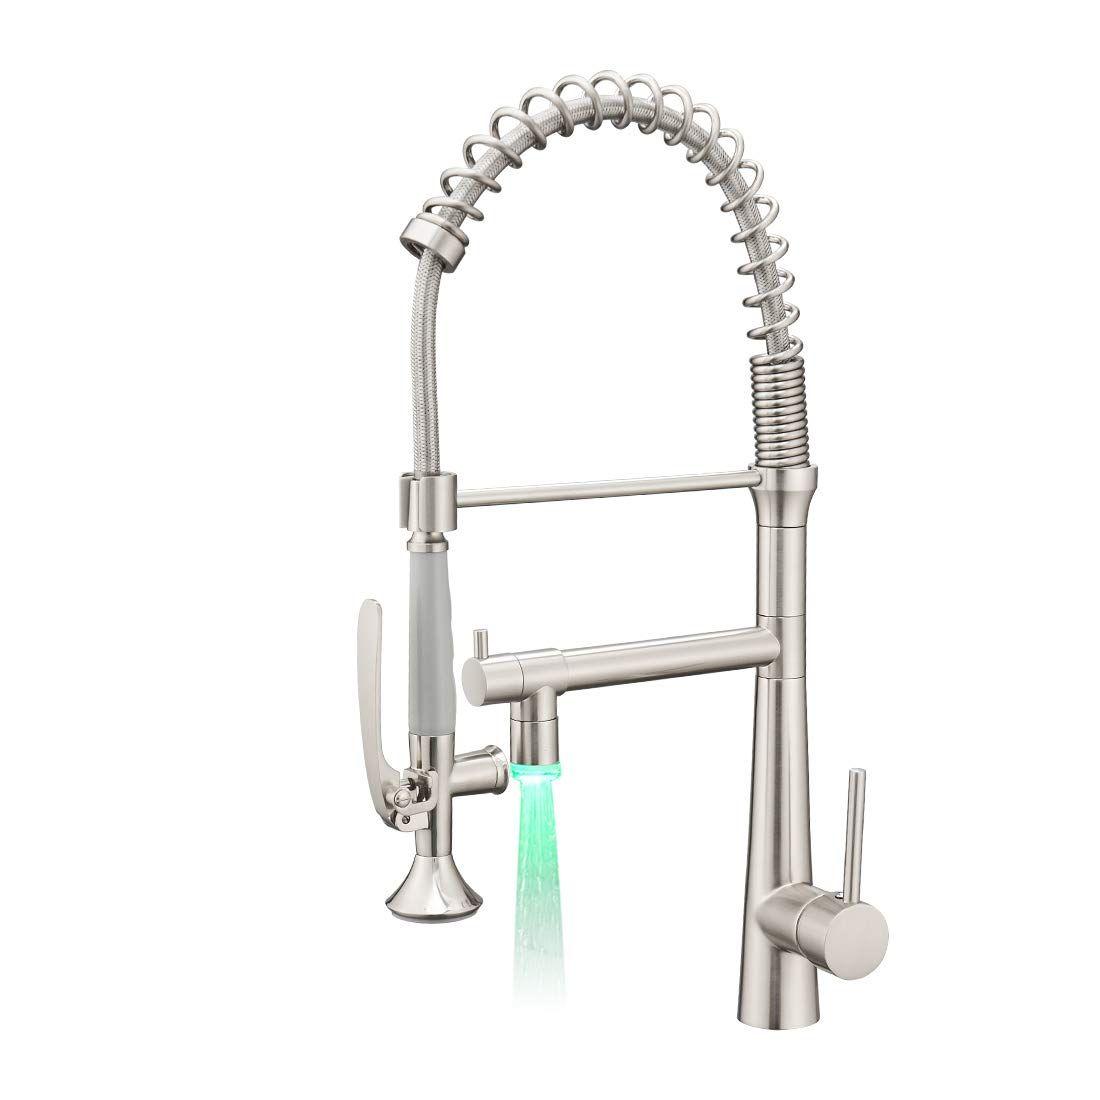 Aimadi Pull Down Kitchen Faucet Kitchen Sink Faucets Kitchen Faucet With Sprayer Kitchen Faucet